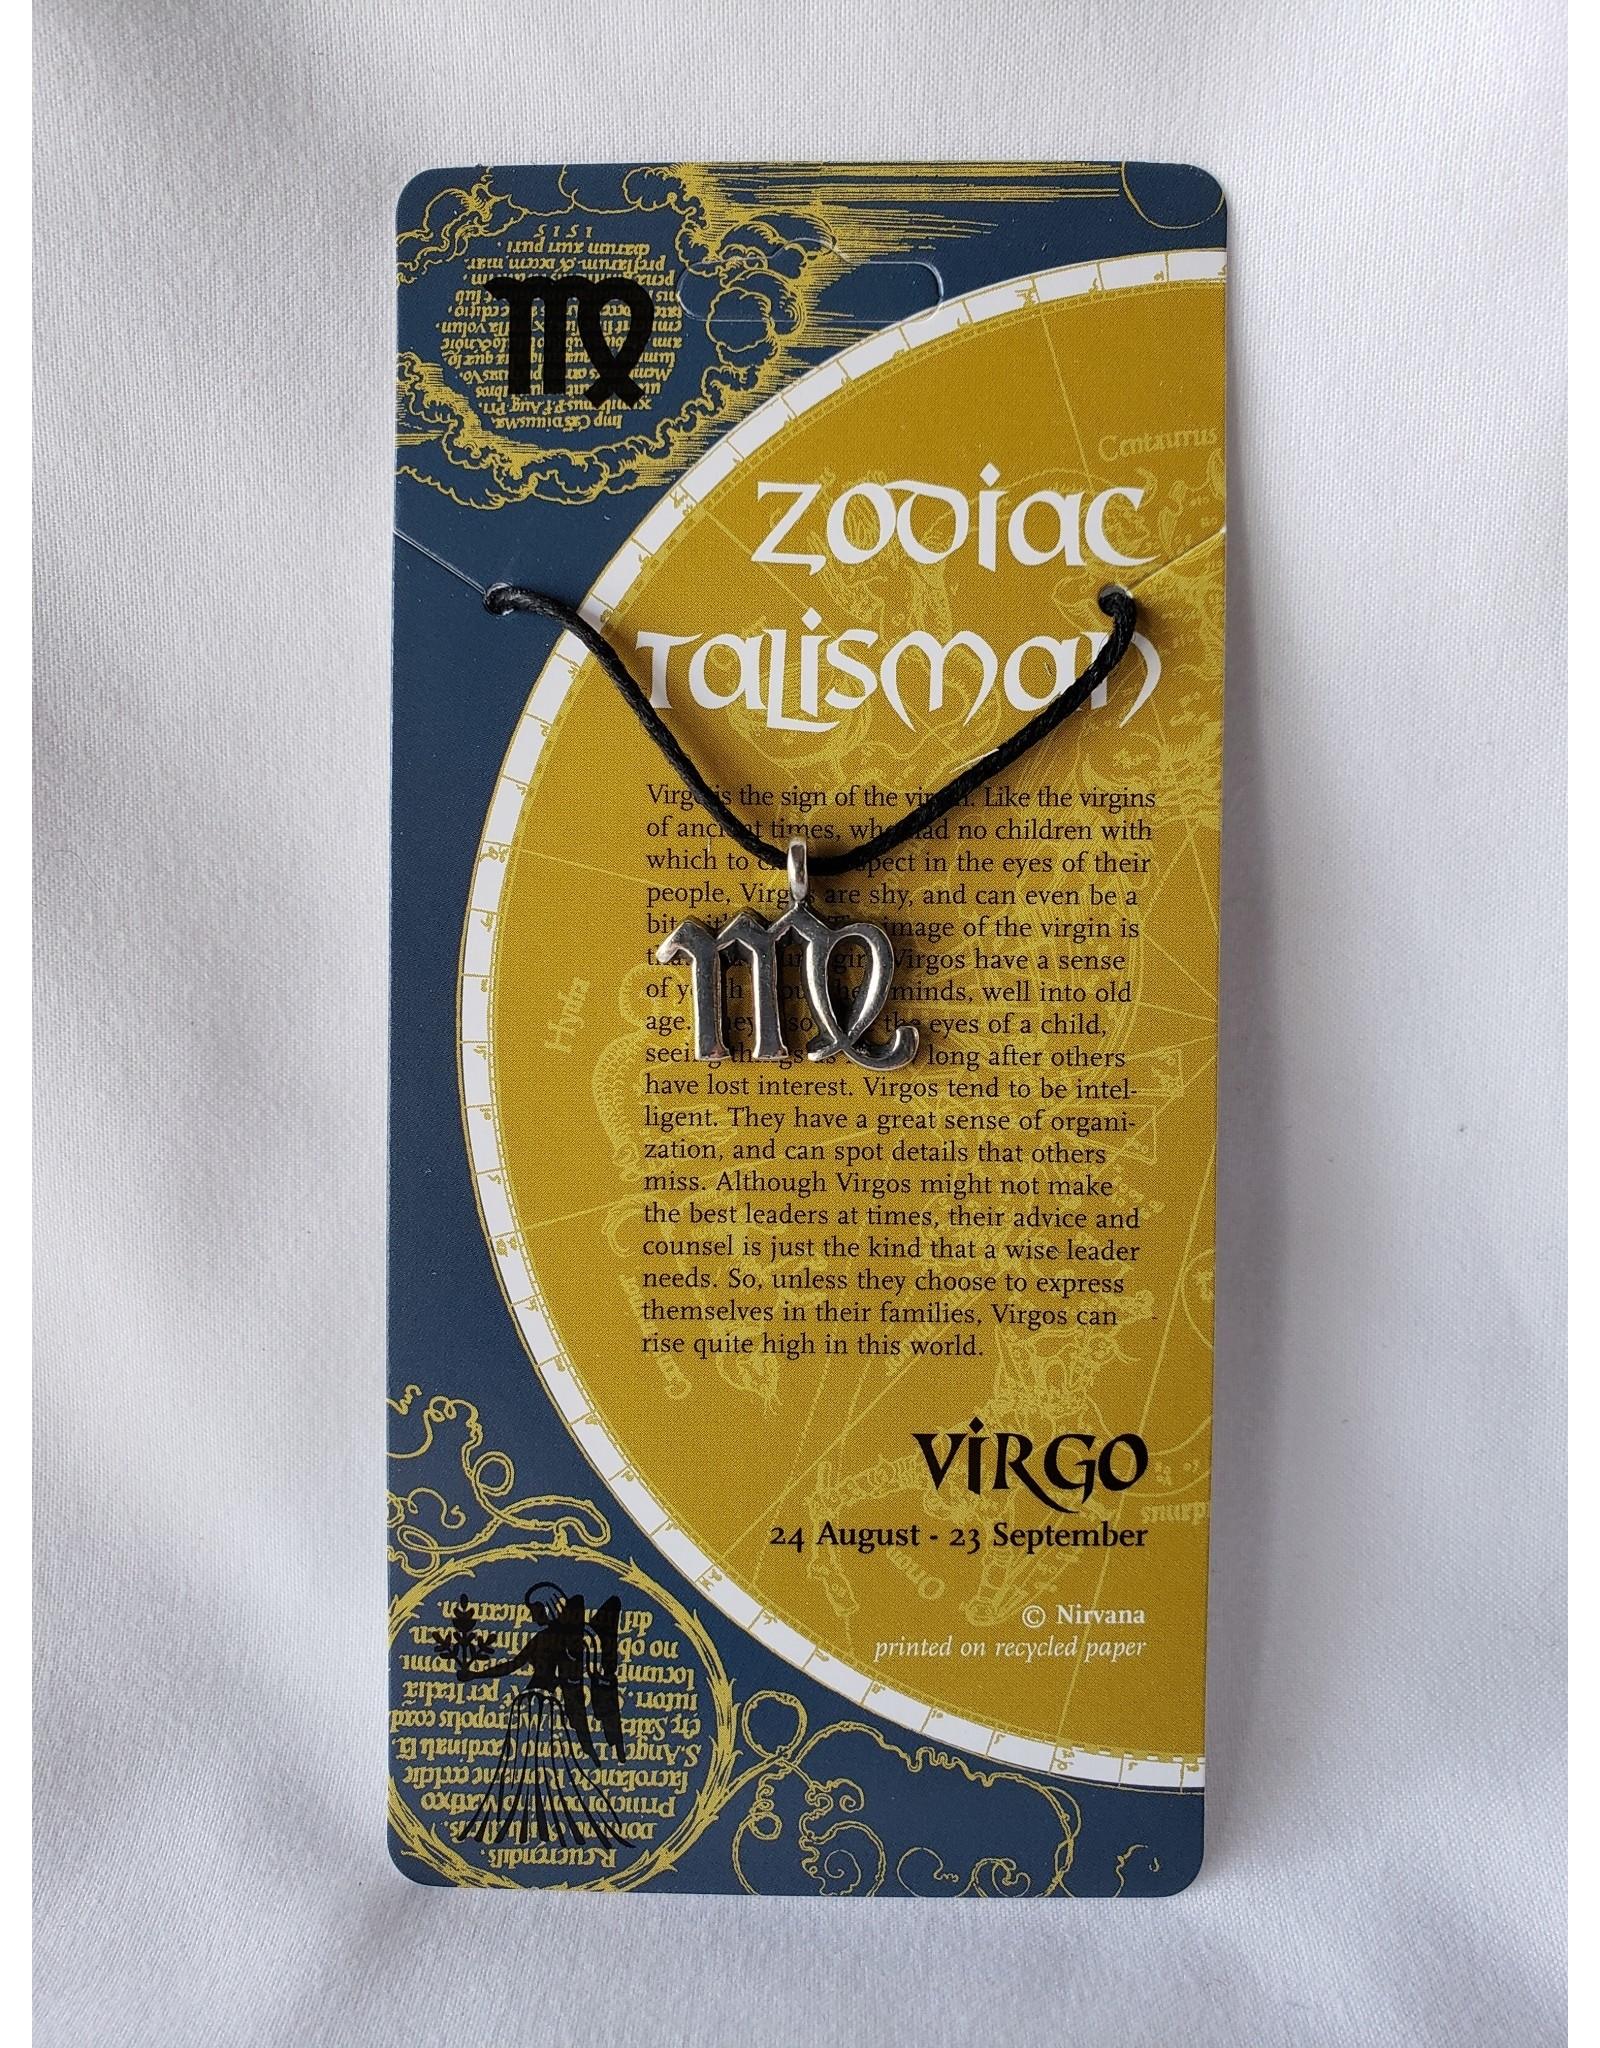 Nirvana Small Zodiac Talismans - Virgo